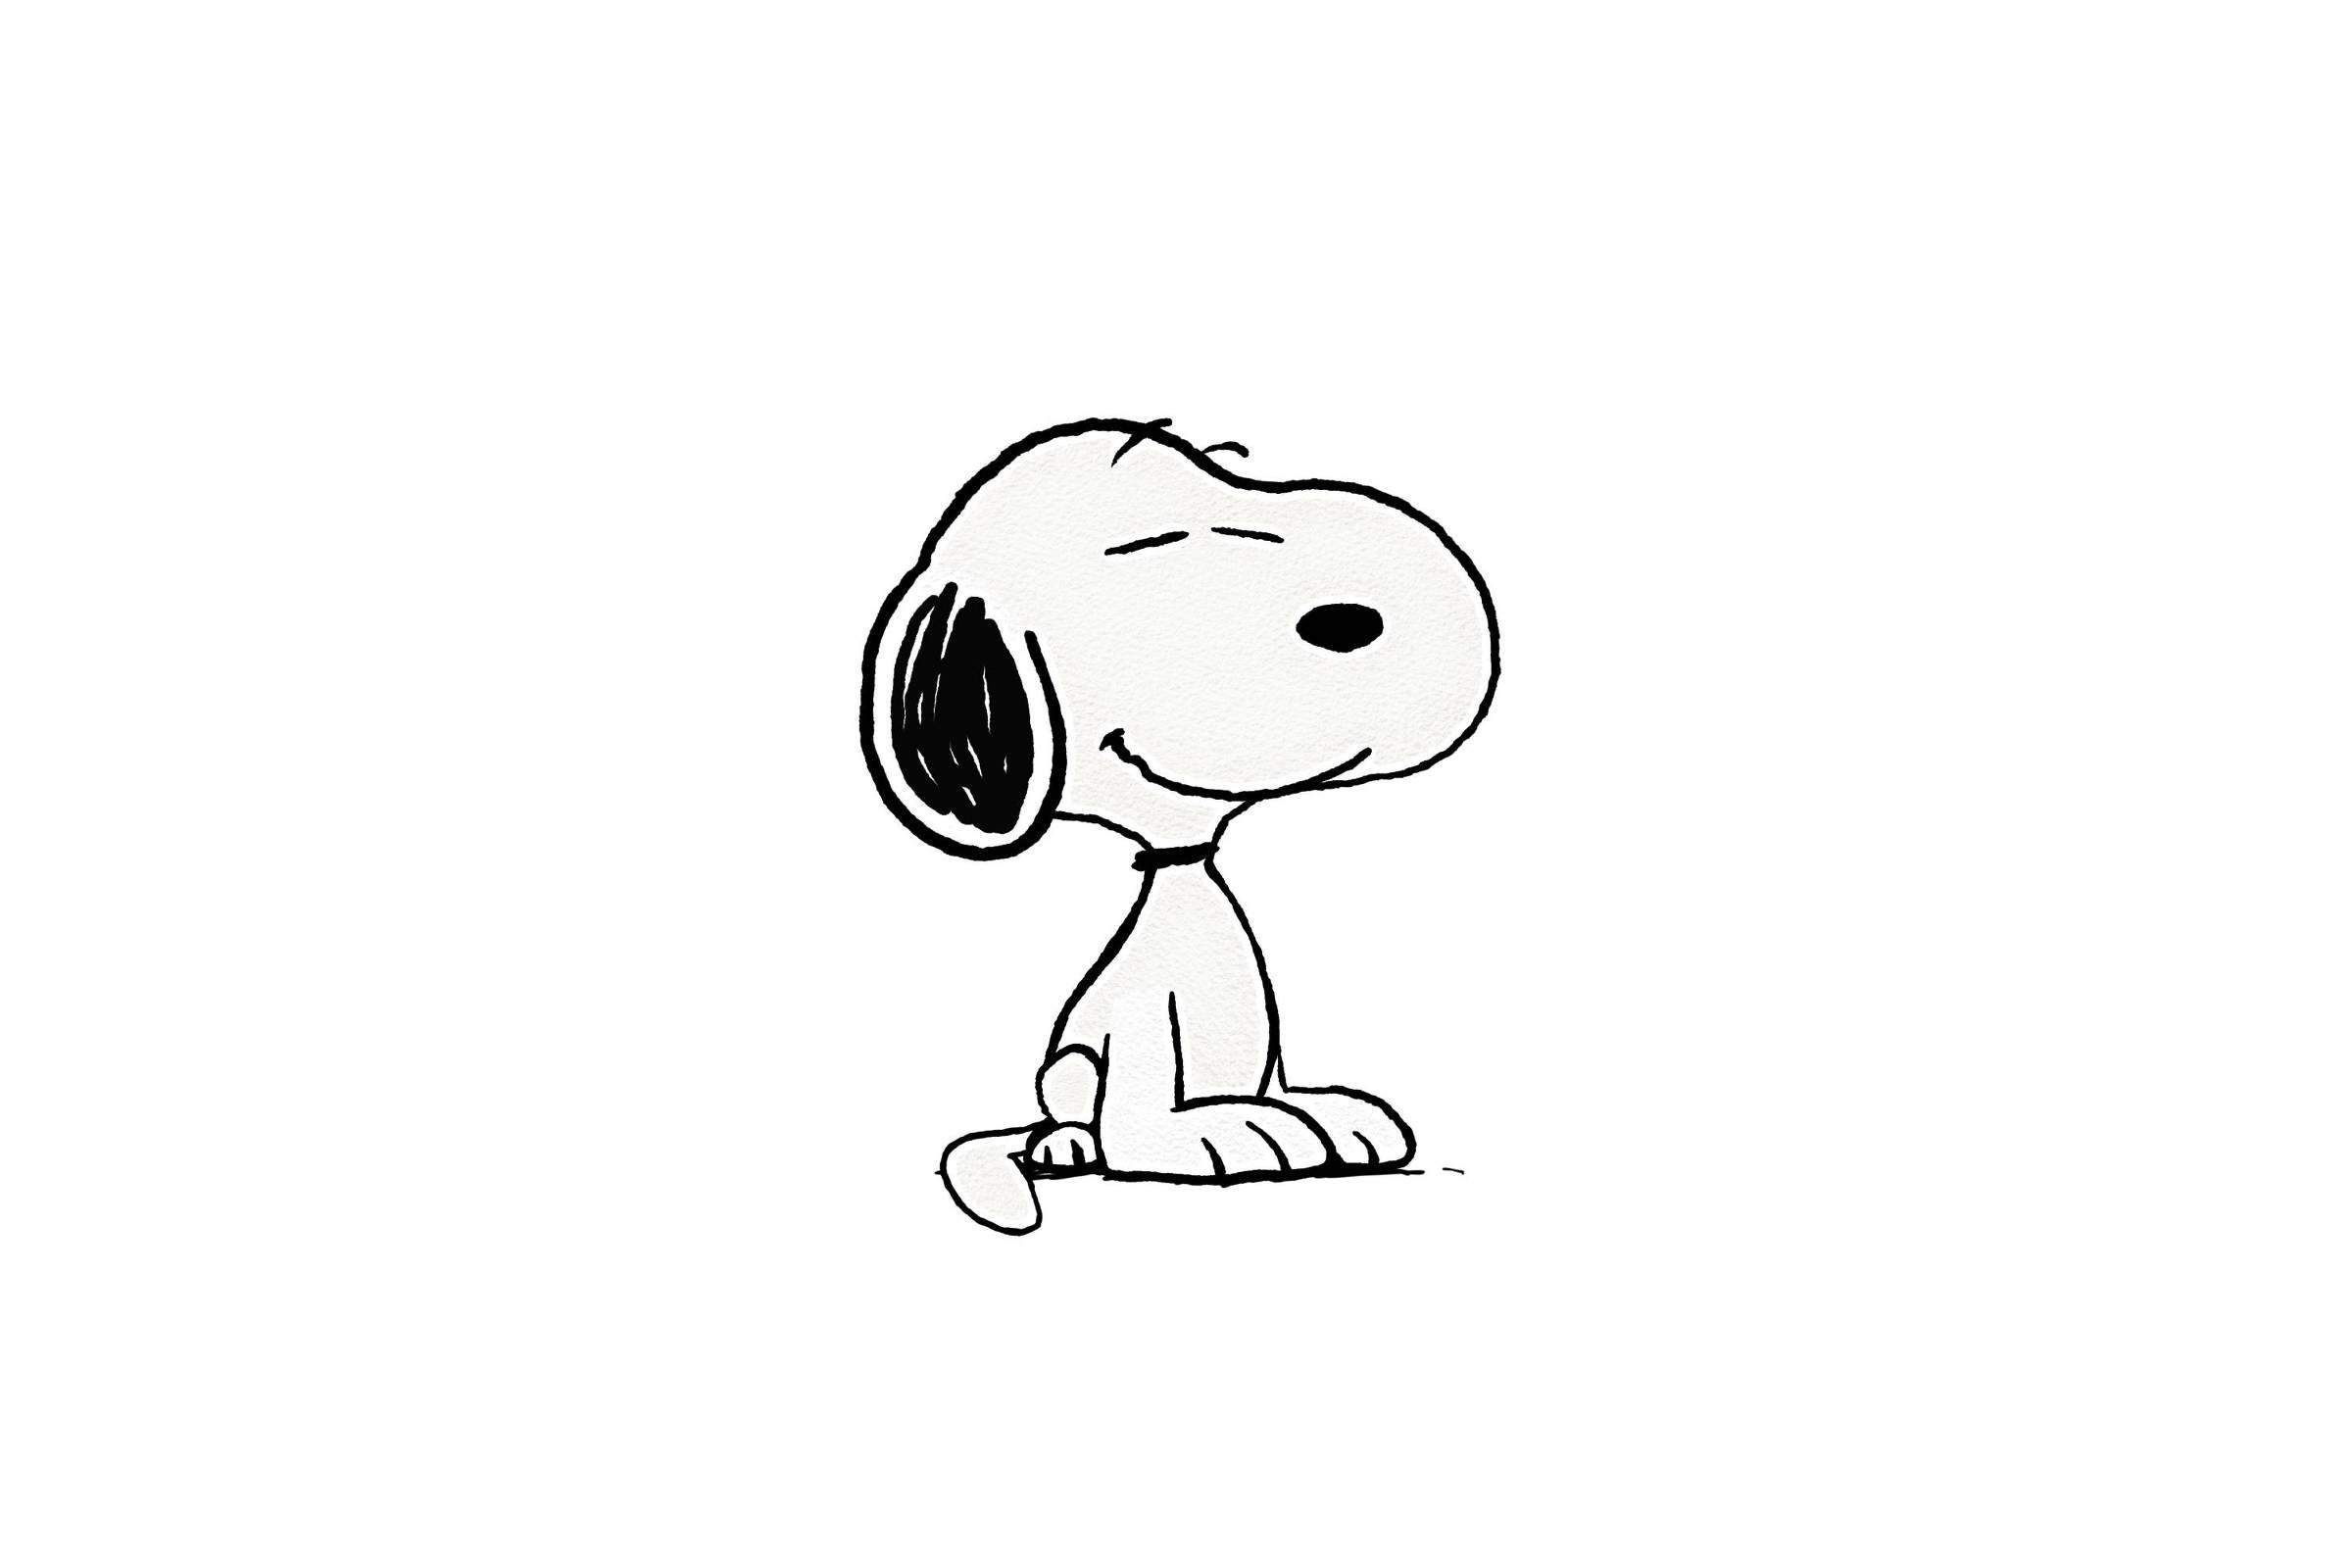 F5 Nerdices Apple Produzira Serie Com Snoopy 16 12 2018